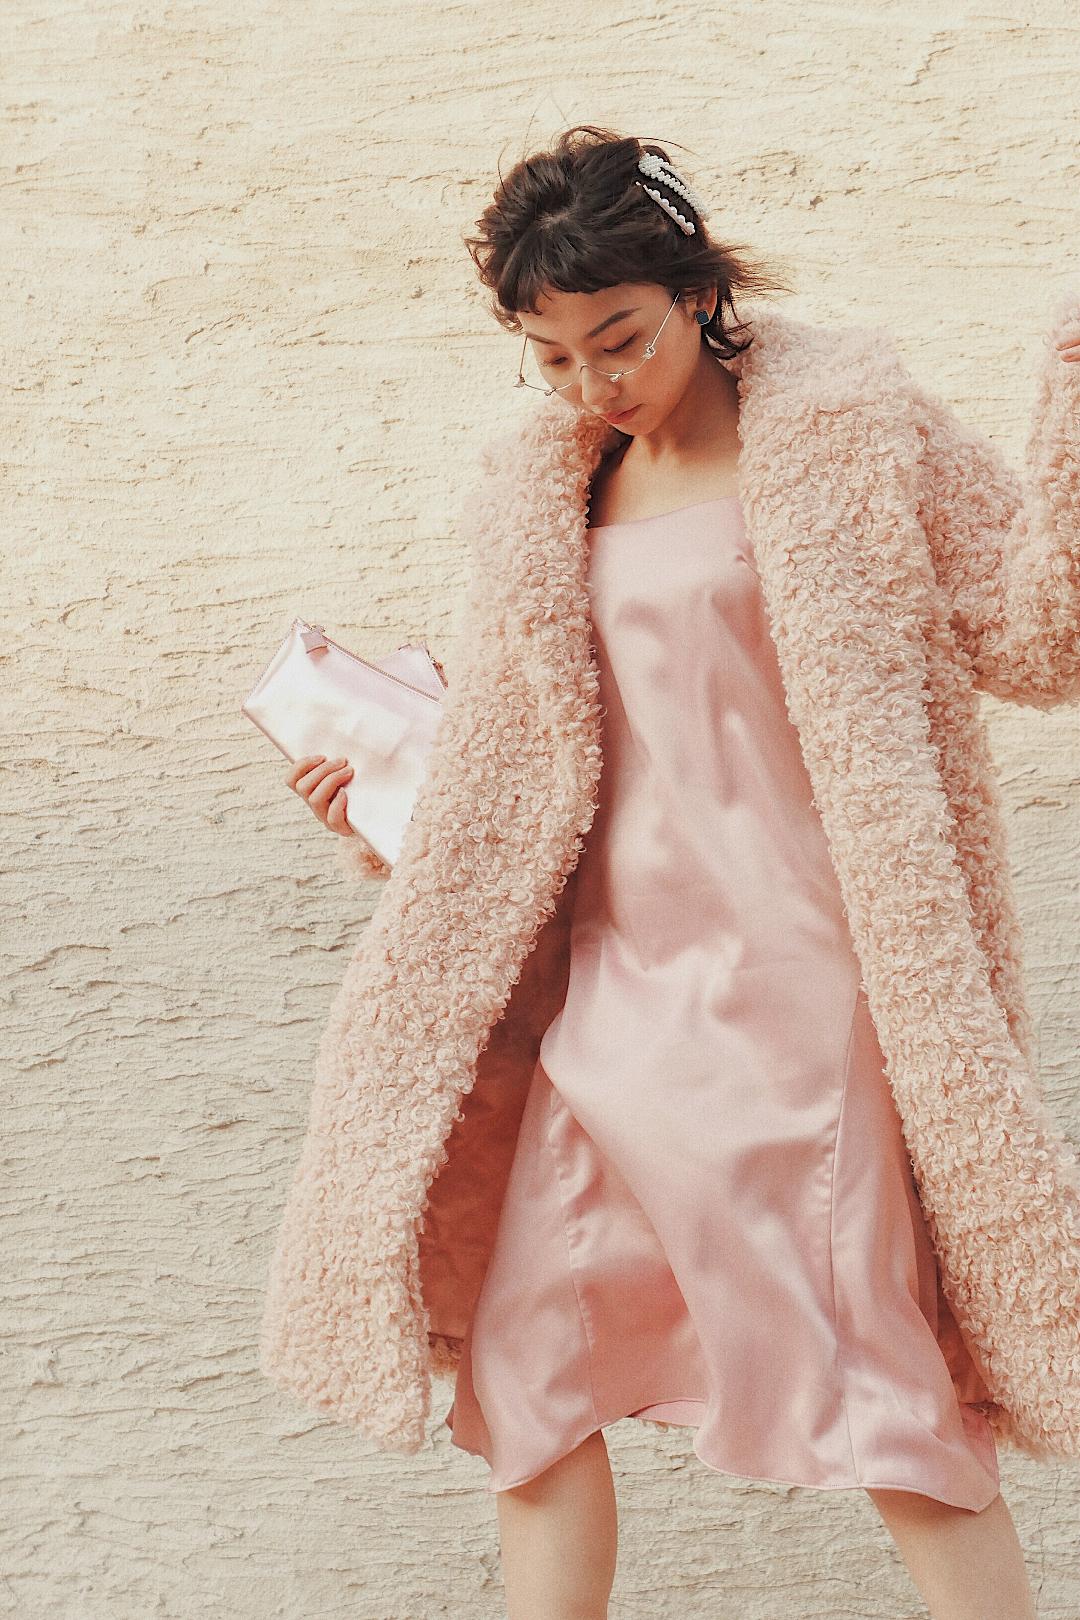 #mini包,装得下少女心就够了# 今天一身all pink少女心爆棚的嗲嗲look💓 粉色毛绒大衣搭粉色丝质吊带裙➕粉色折叠手包,简直超级无敌可爱啦🐶 为了有些街头感,混搭了一双Fila白色老爹鞋,会增加一些酷酷的感觉。 这套搭配配饰也是亮点哦,希望能有气质和色彩上的加成~ 喜欢这套look别忘记点赞👍🏻和评论💬,让我知道哦😇